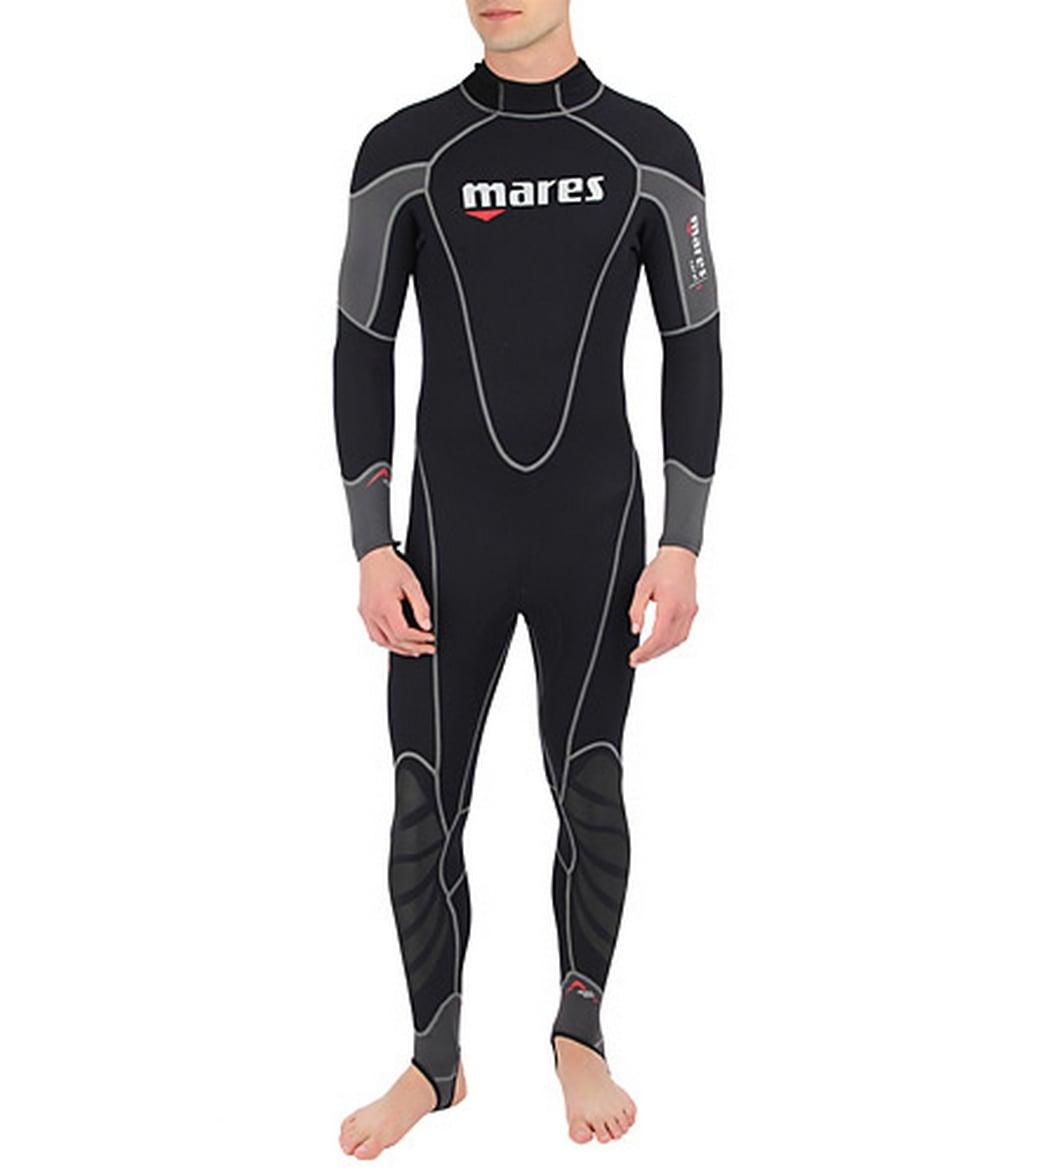 c200e71da5 Mares Men s Coral Wetsuit at SwimOutlet.com - Free Shipping